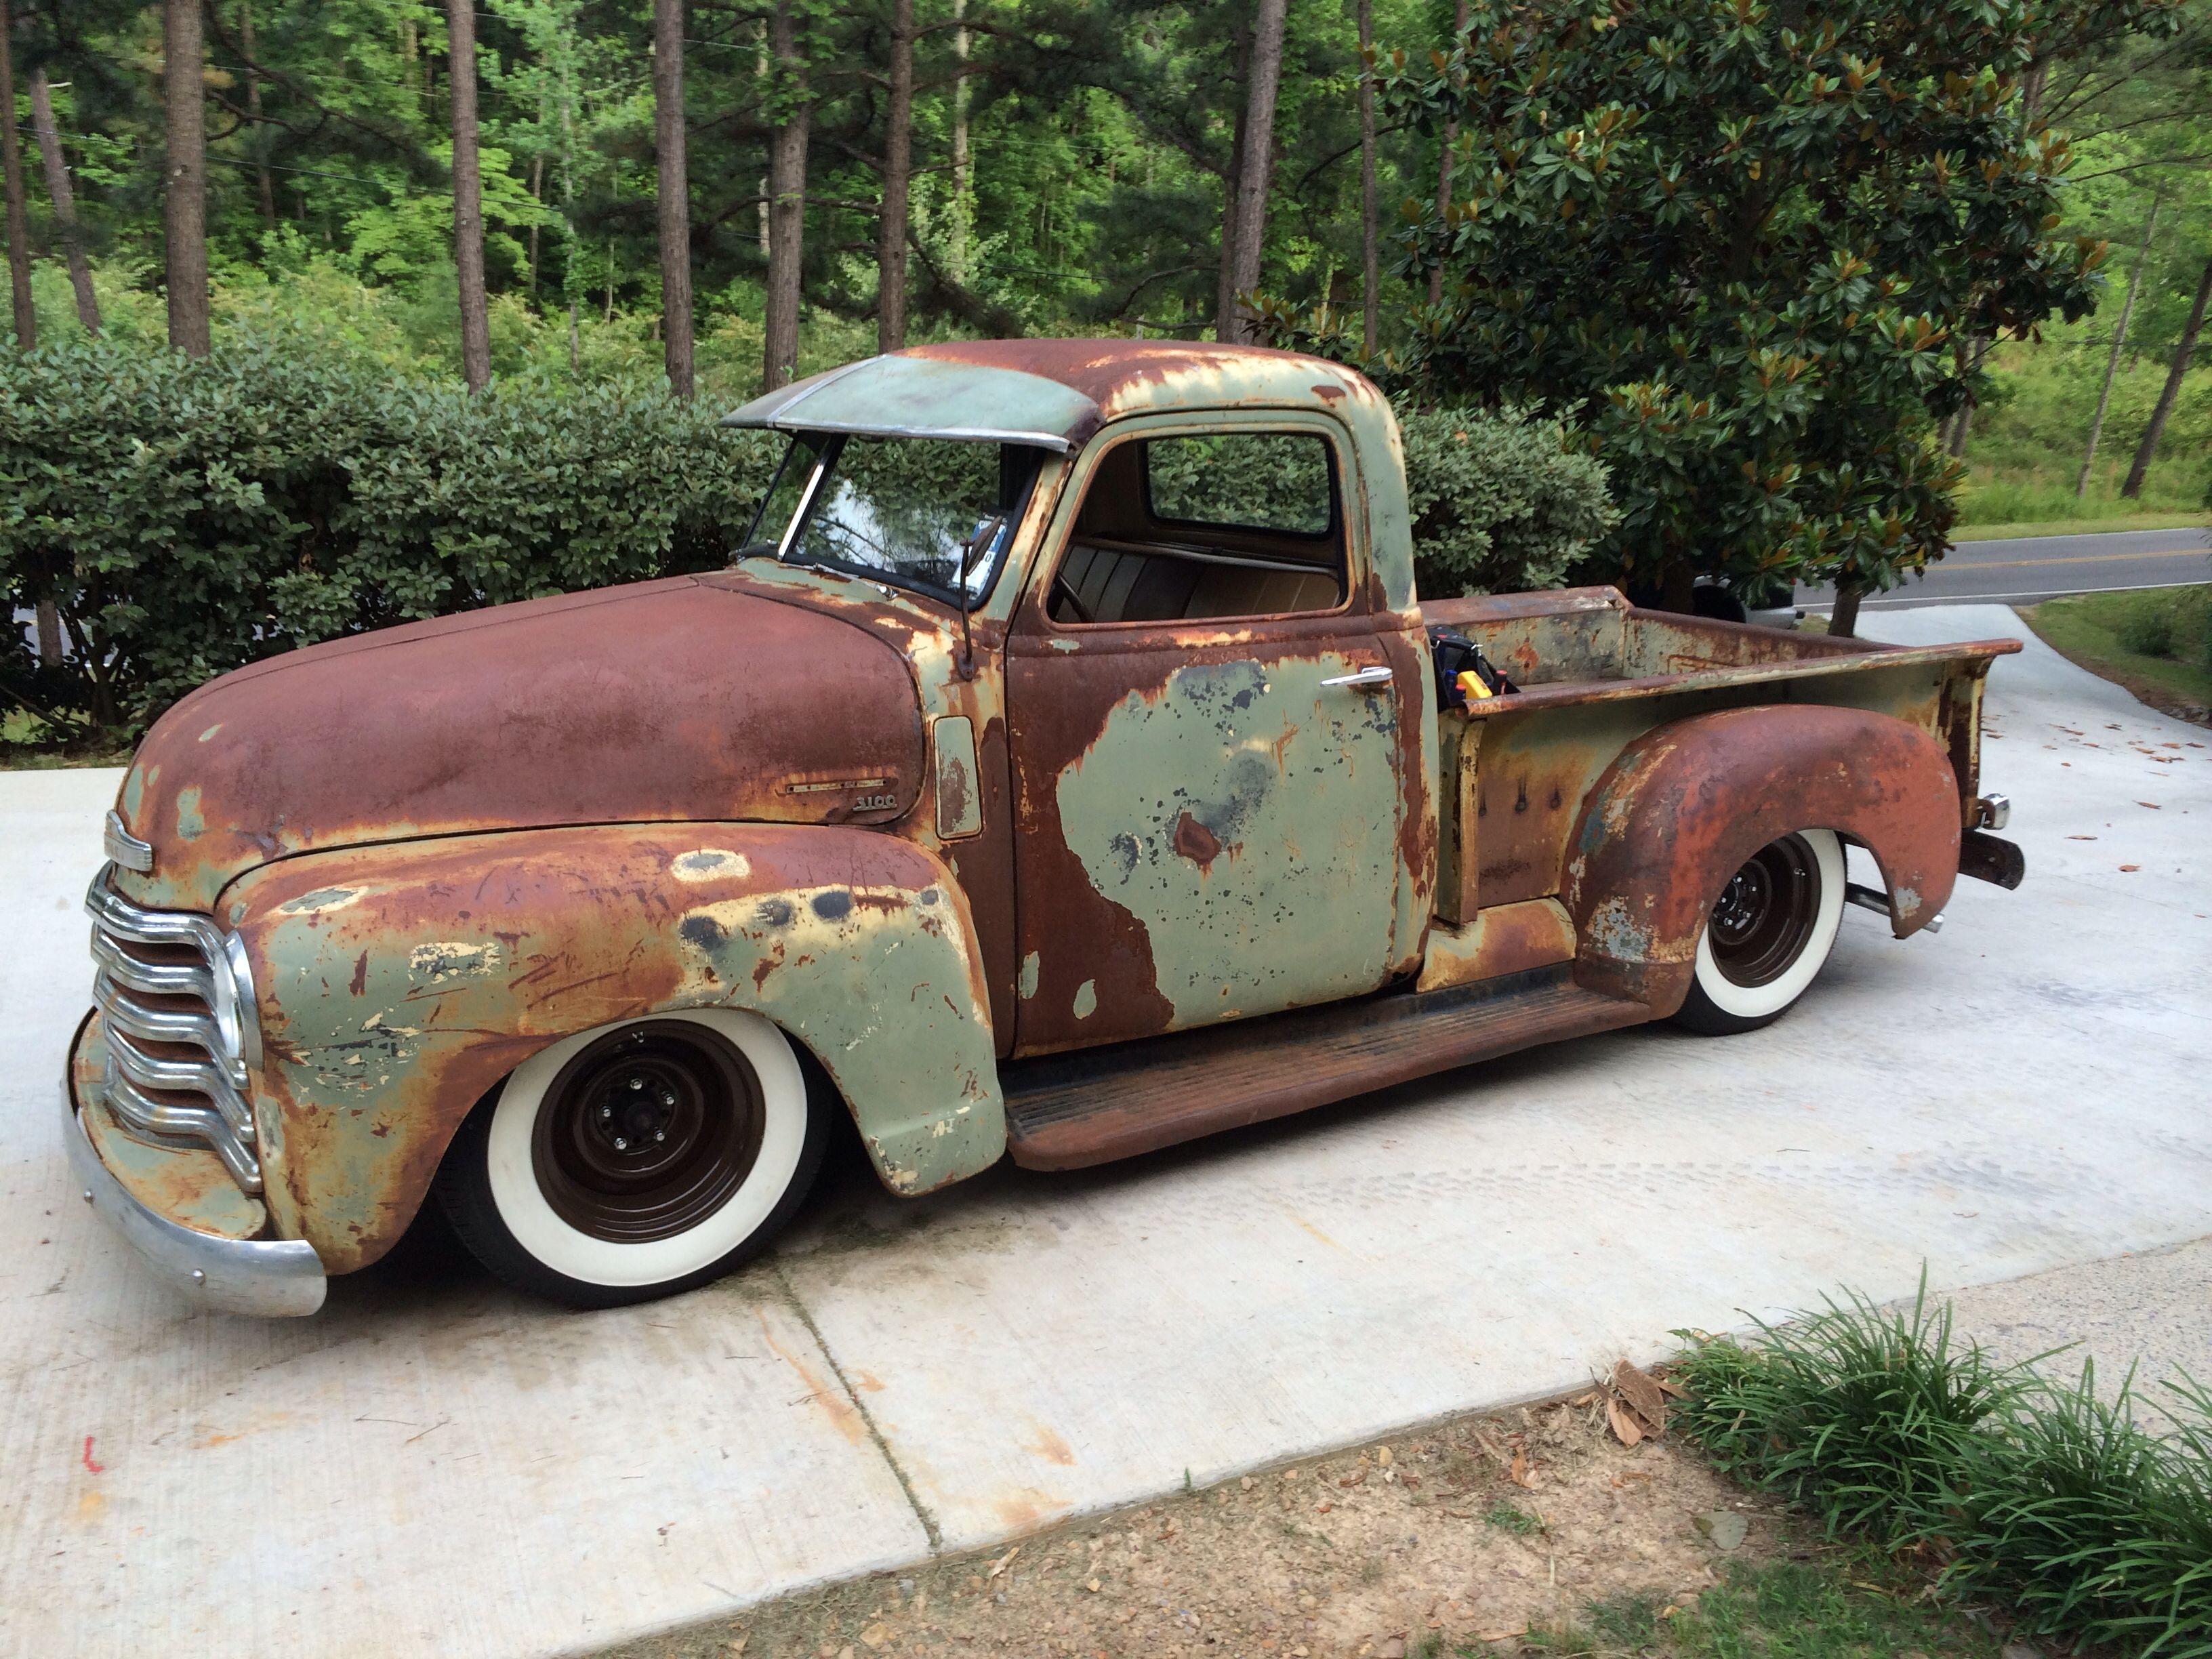 My 1949 Chevy truck patina